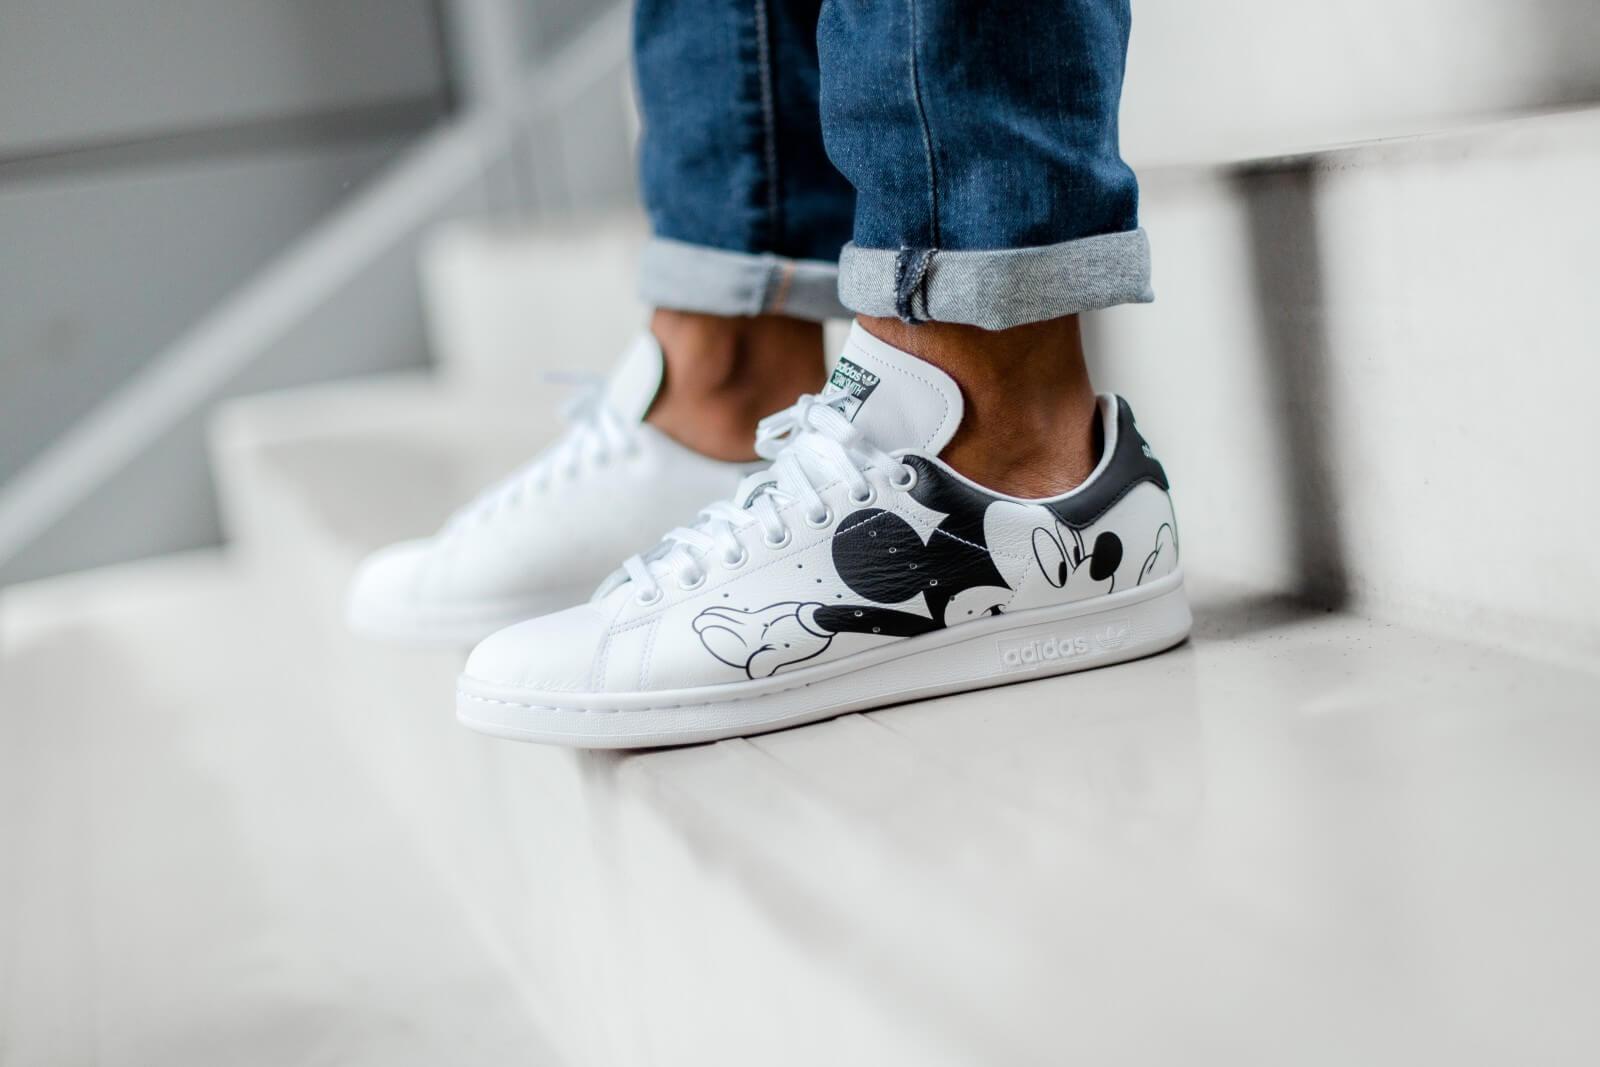 Adidas x Disney Superstar Footwear WhiteCore Black